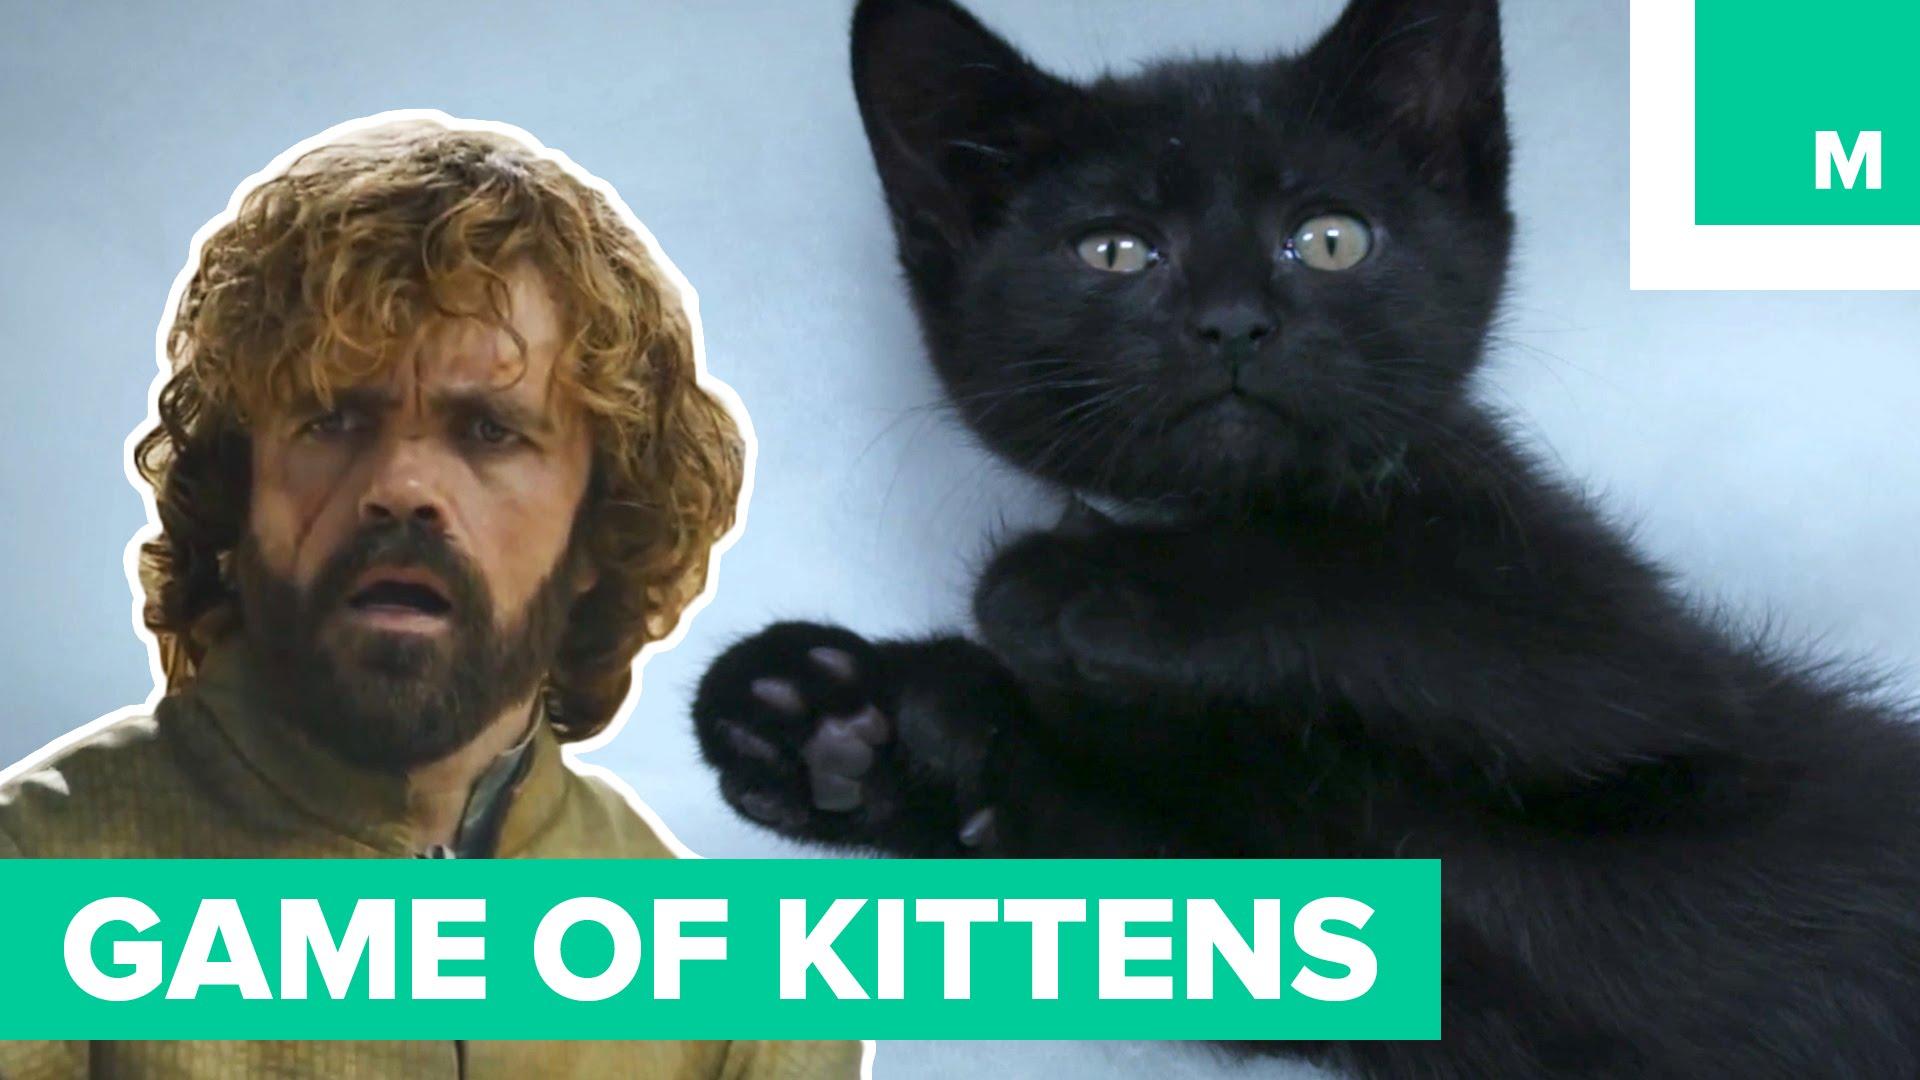 Kittens Remake Season 5 of 'Game of Thrones'